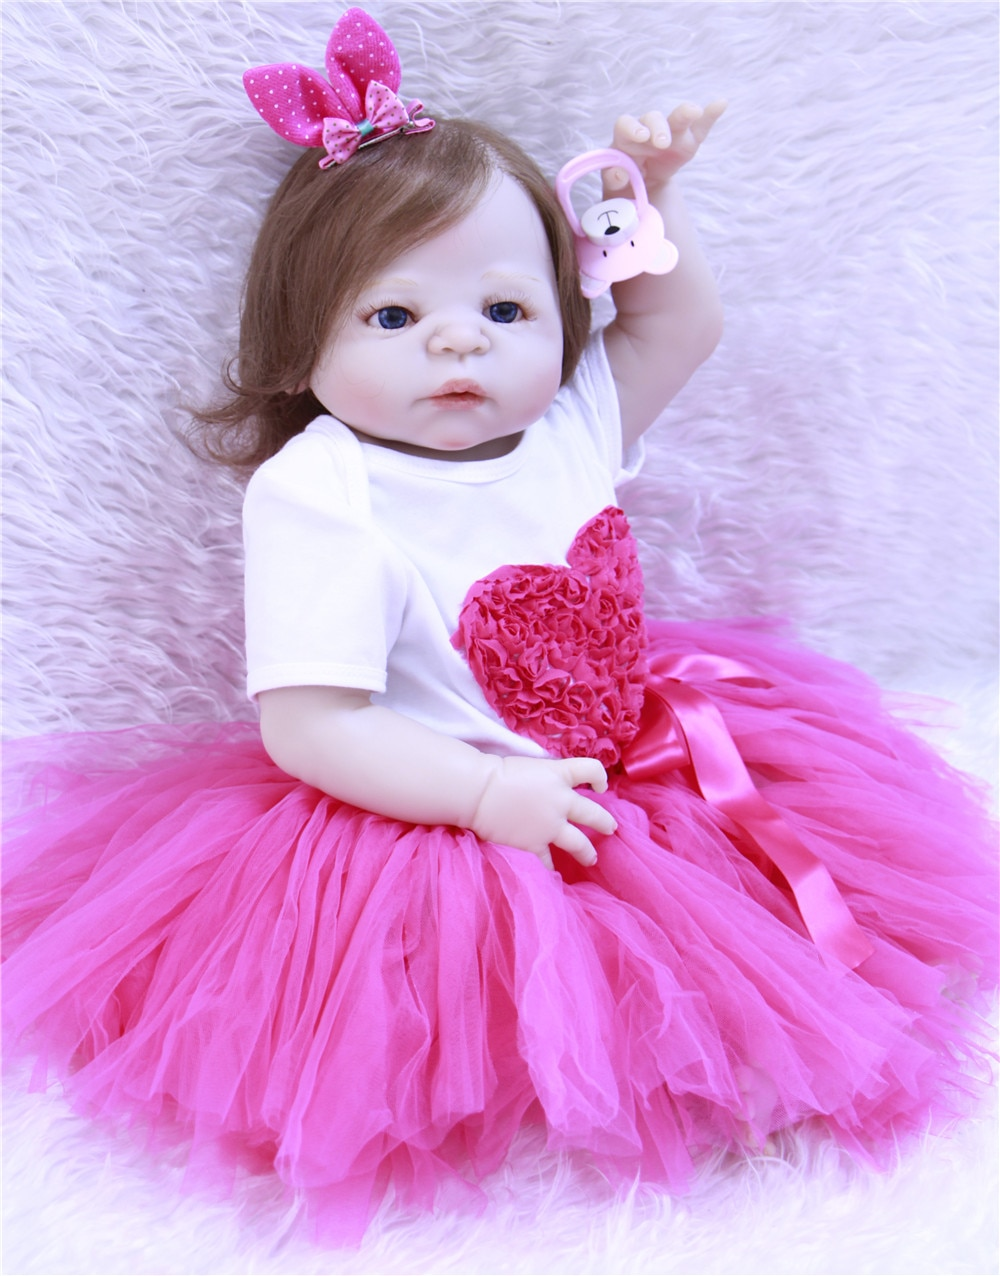 Bebes Reborn 22 pulgadas 55cm Full silicone reborn muñecas bebé como pelo humano real enraizado reborn pupé enfant niño regalo Juguetes